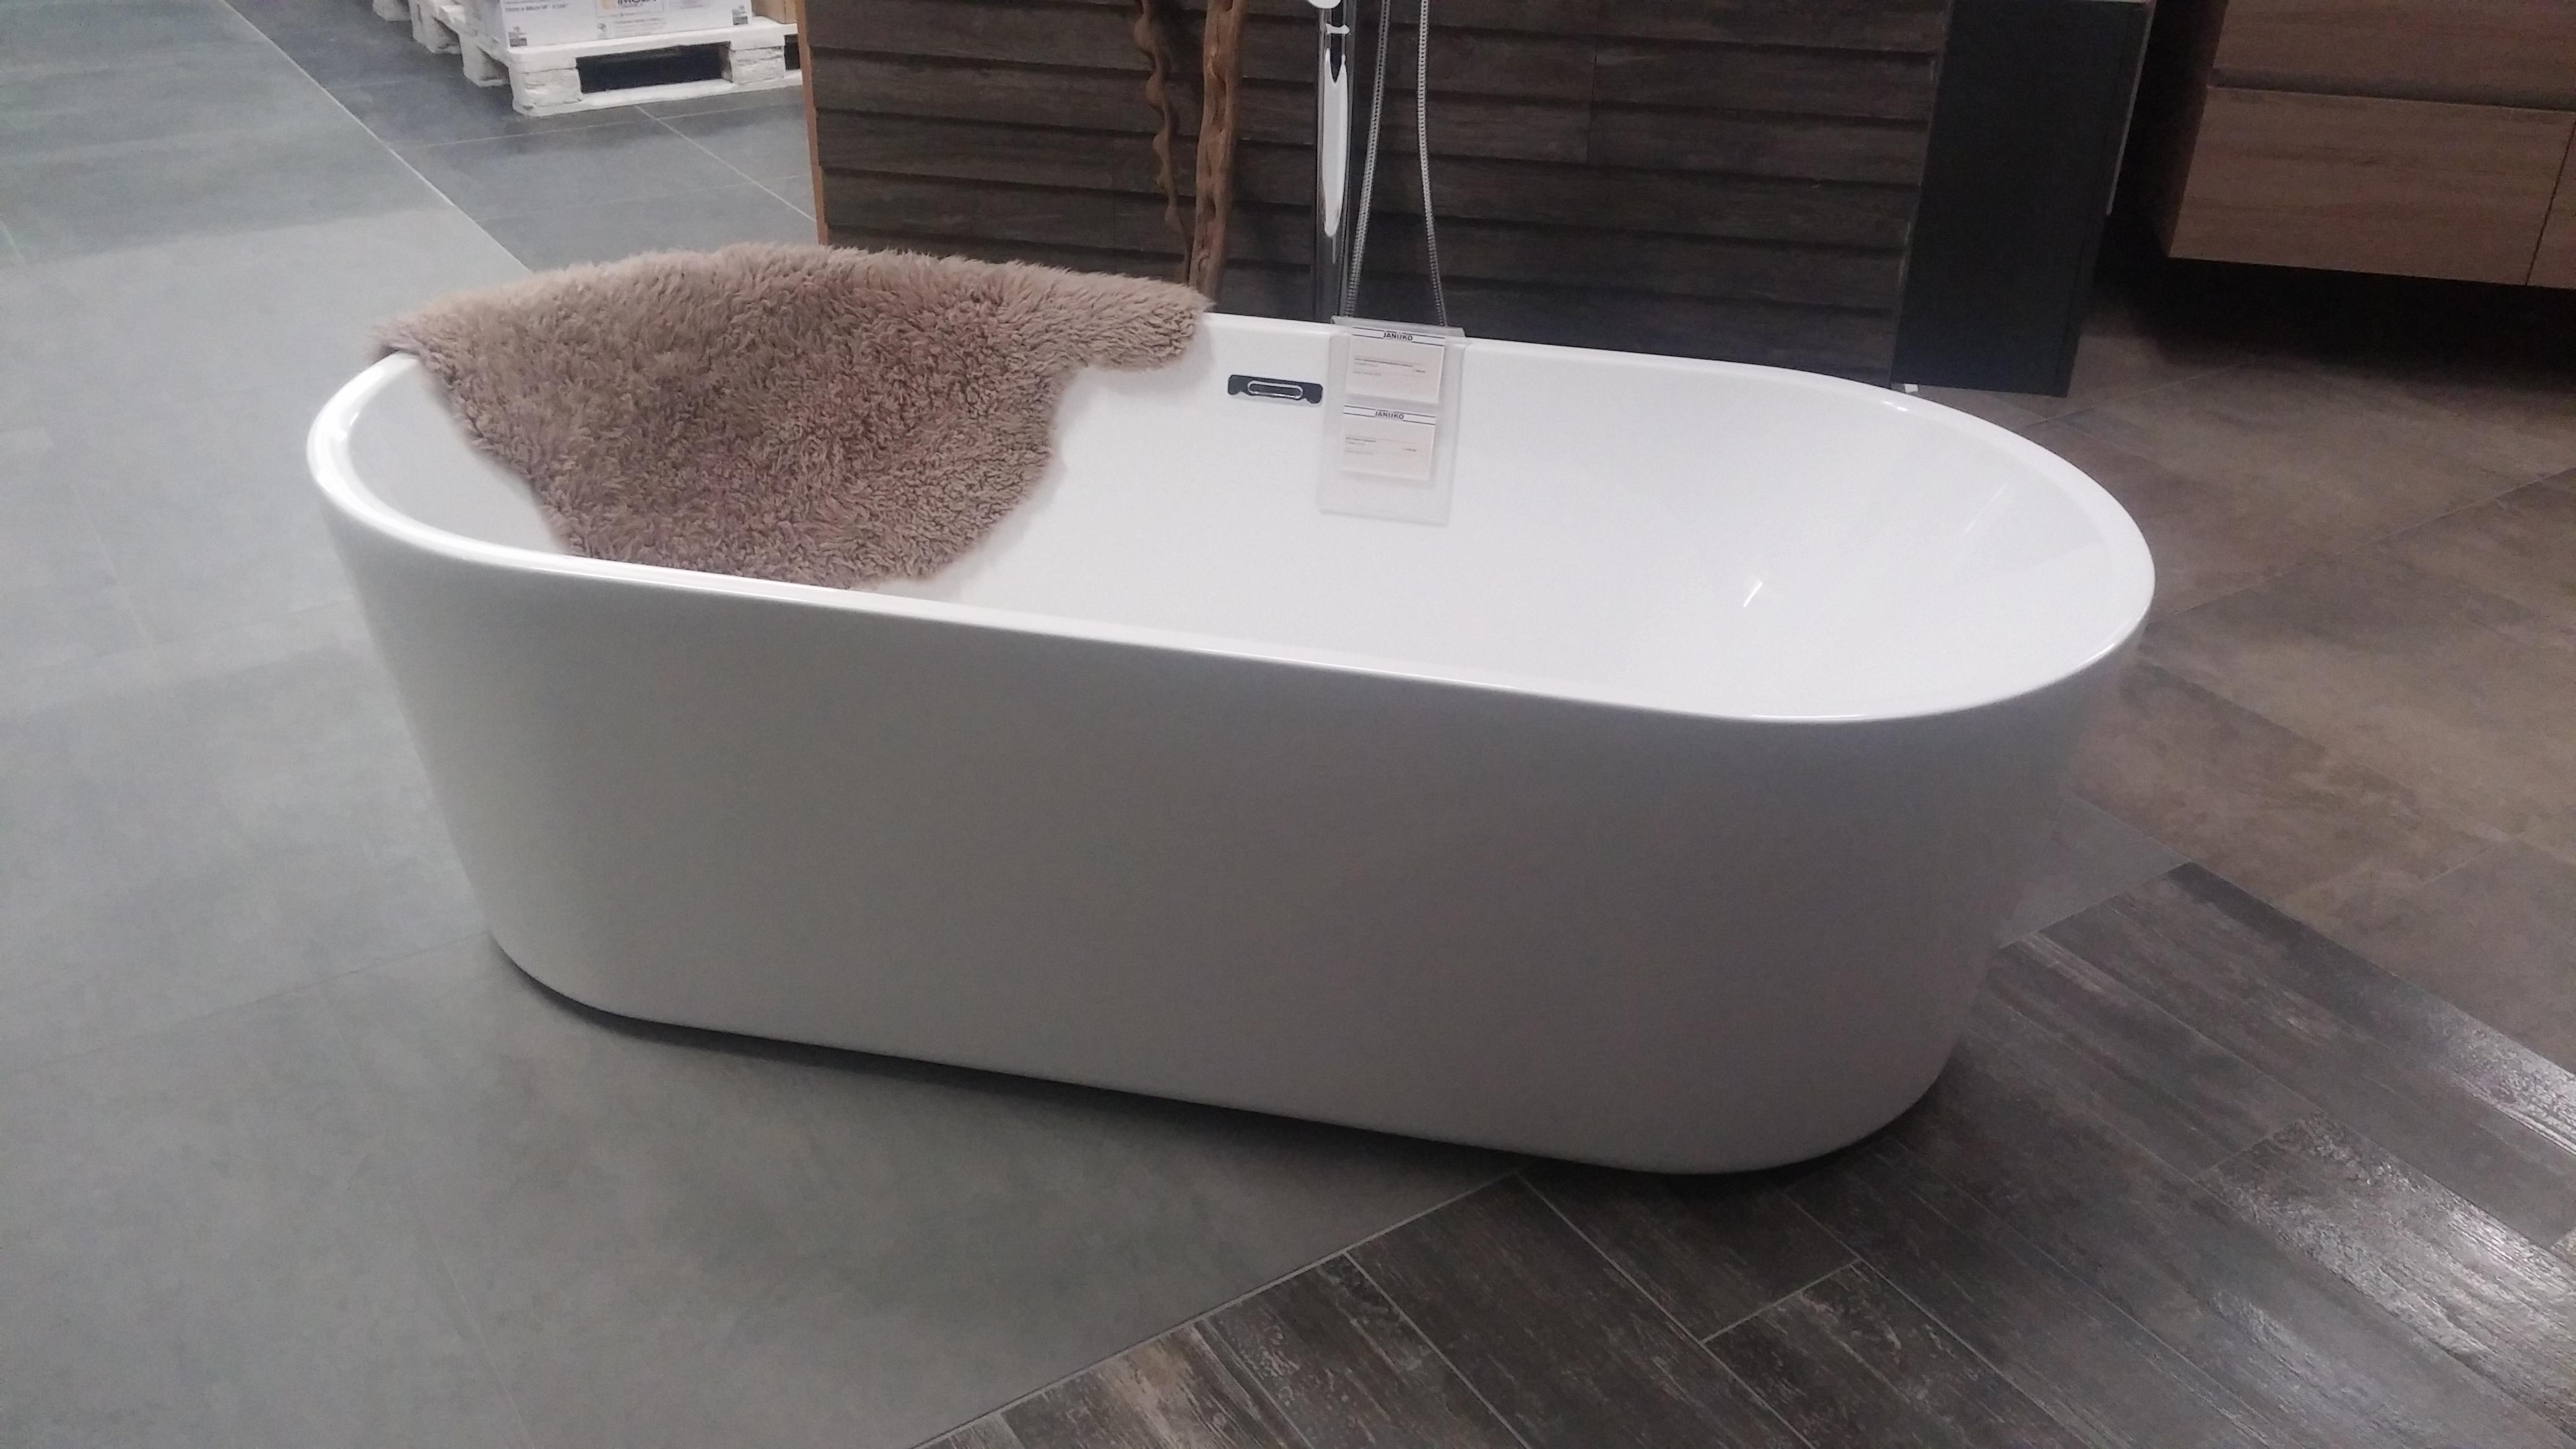 Houten vloer badkamer waterdicht maken